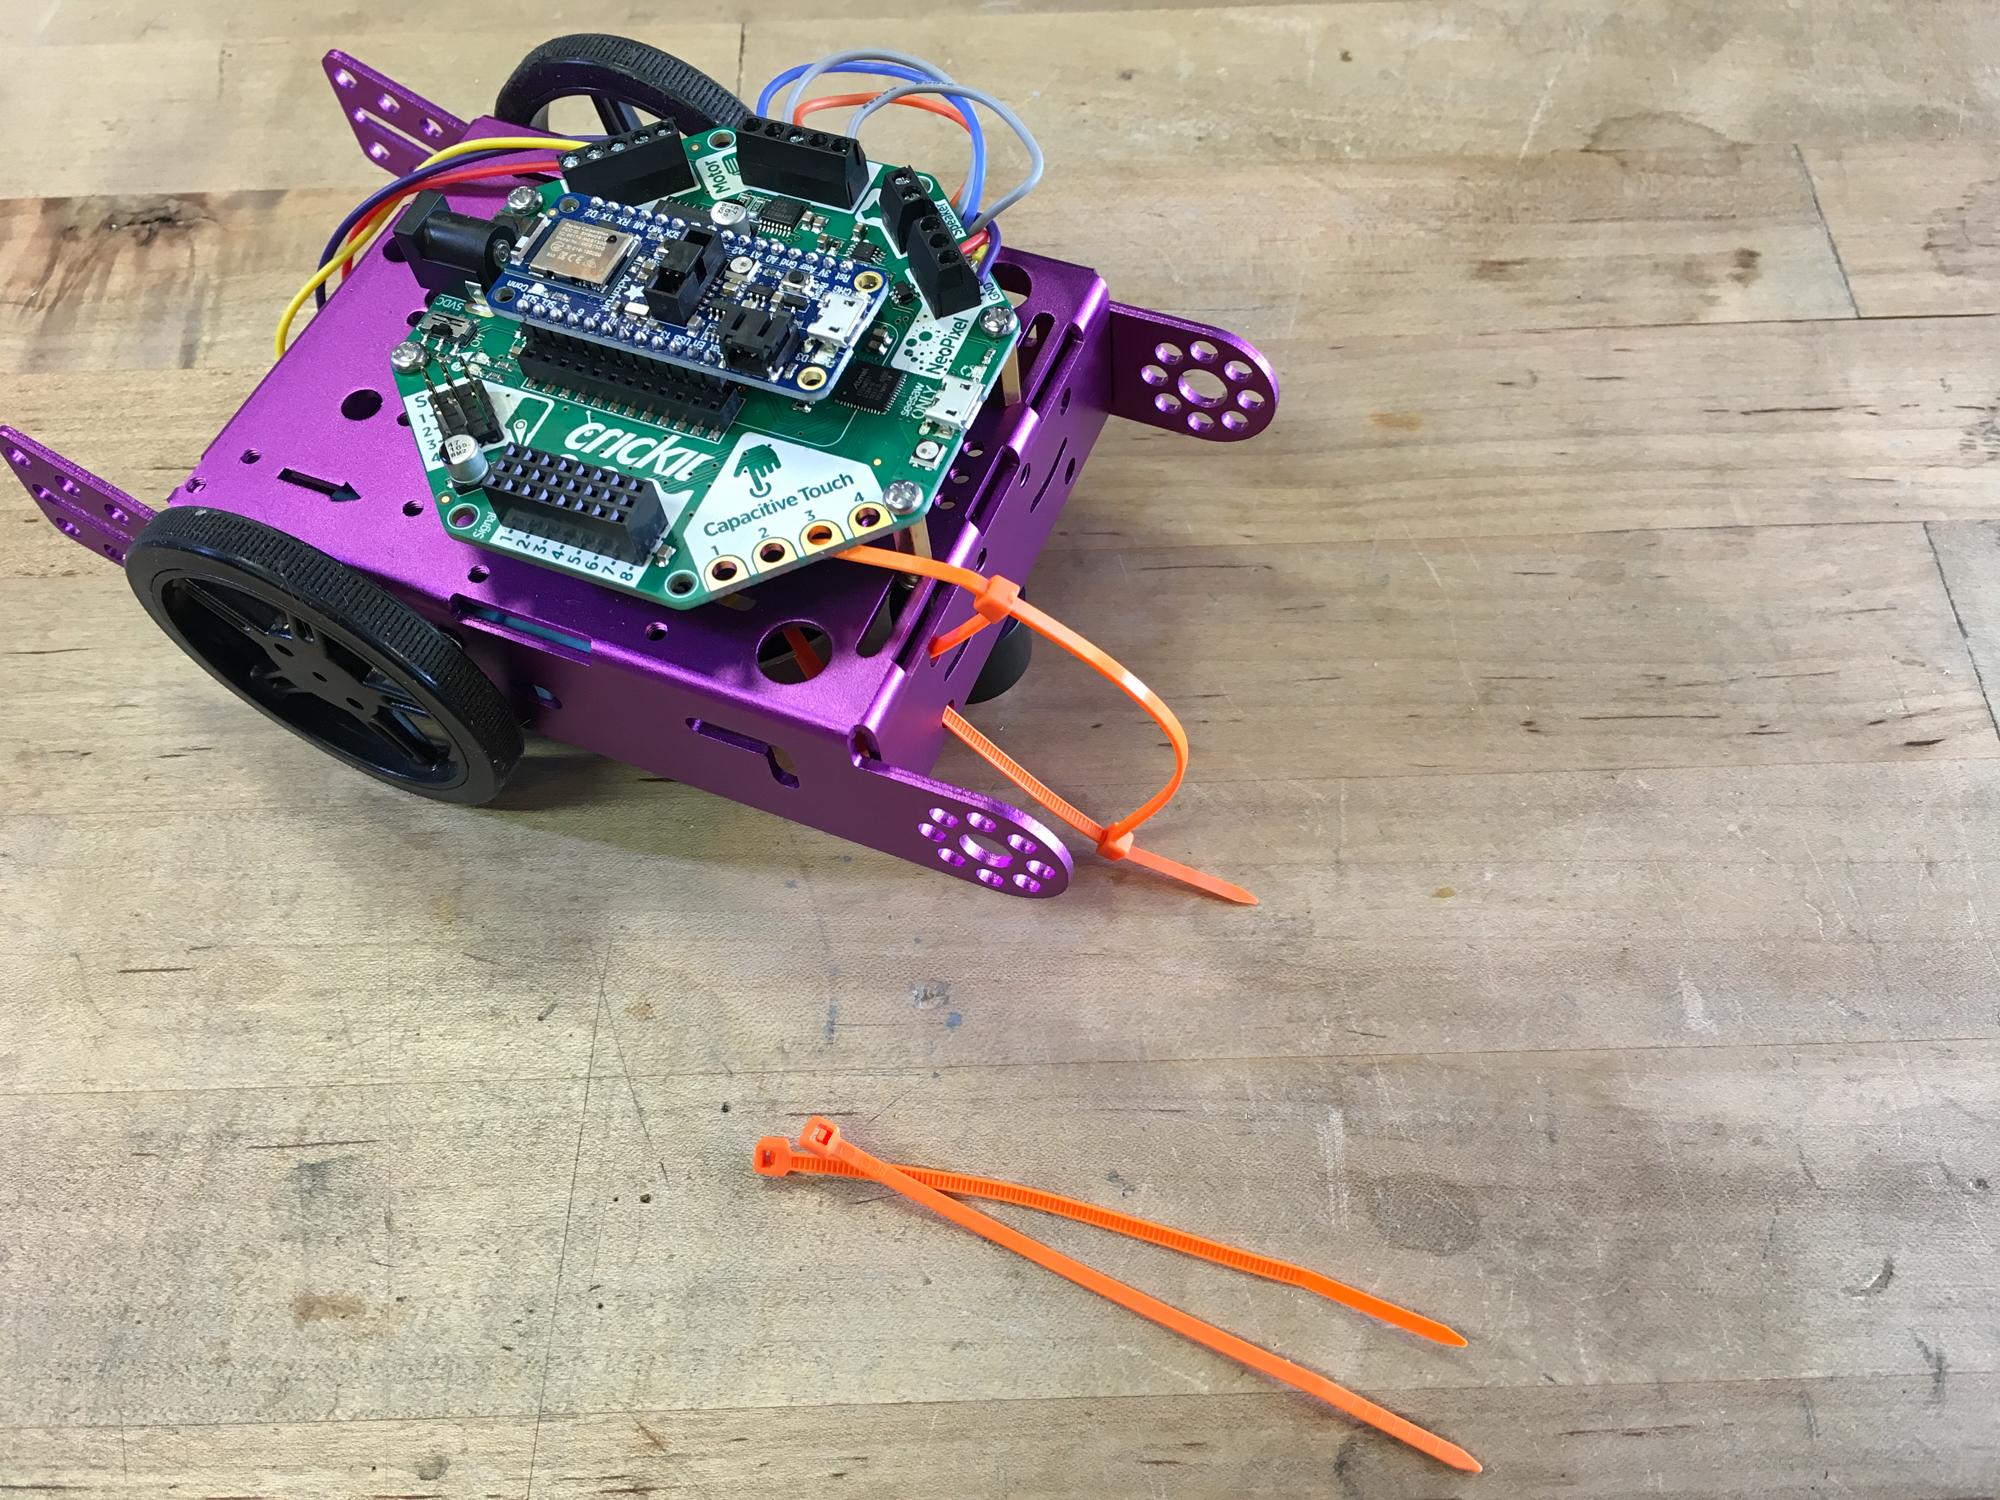 robotics___cnc_IMG_6593_2k.jpg